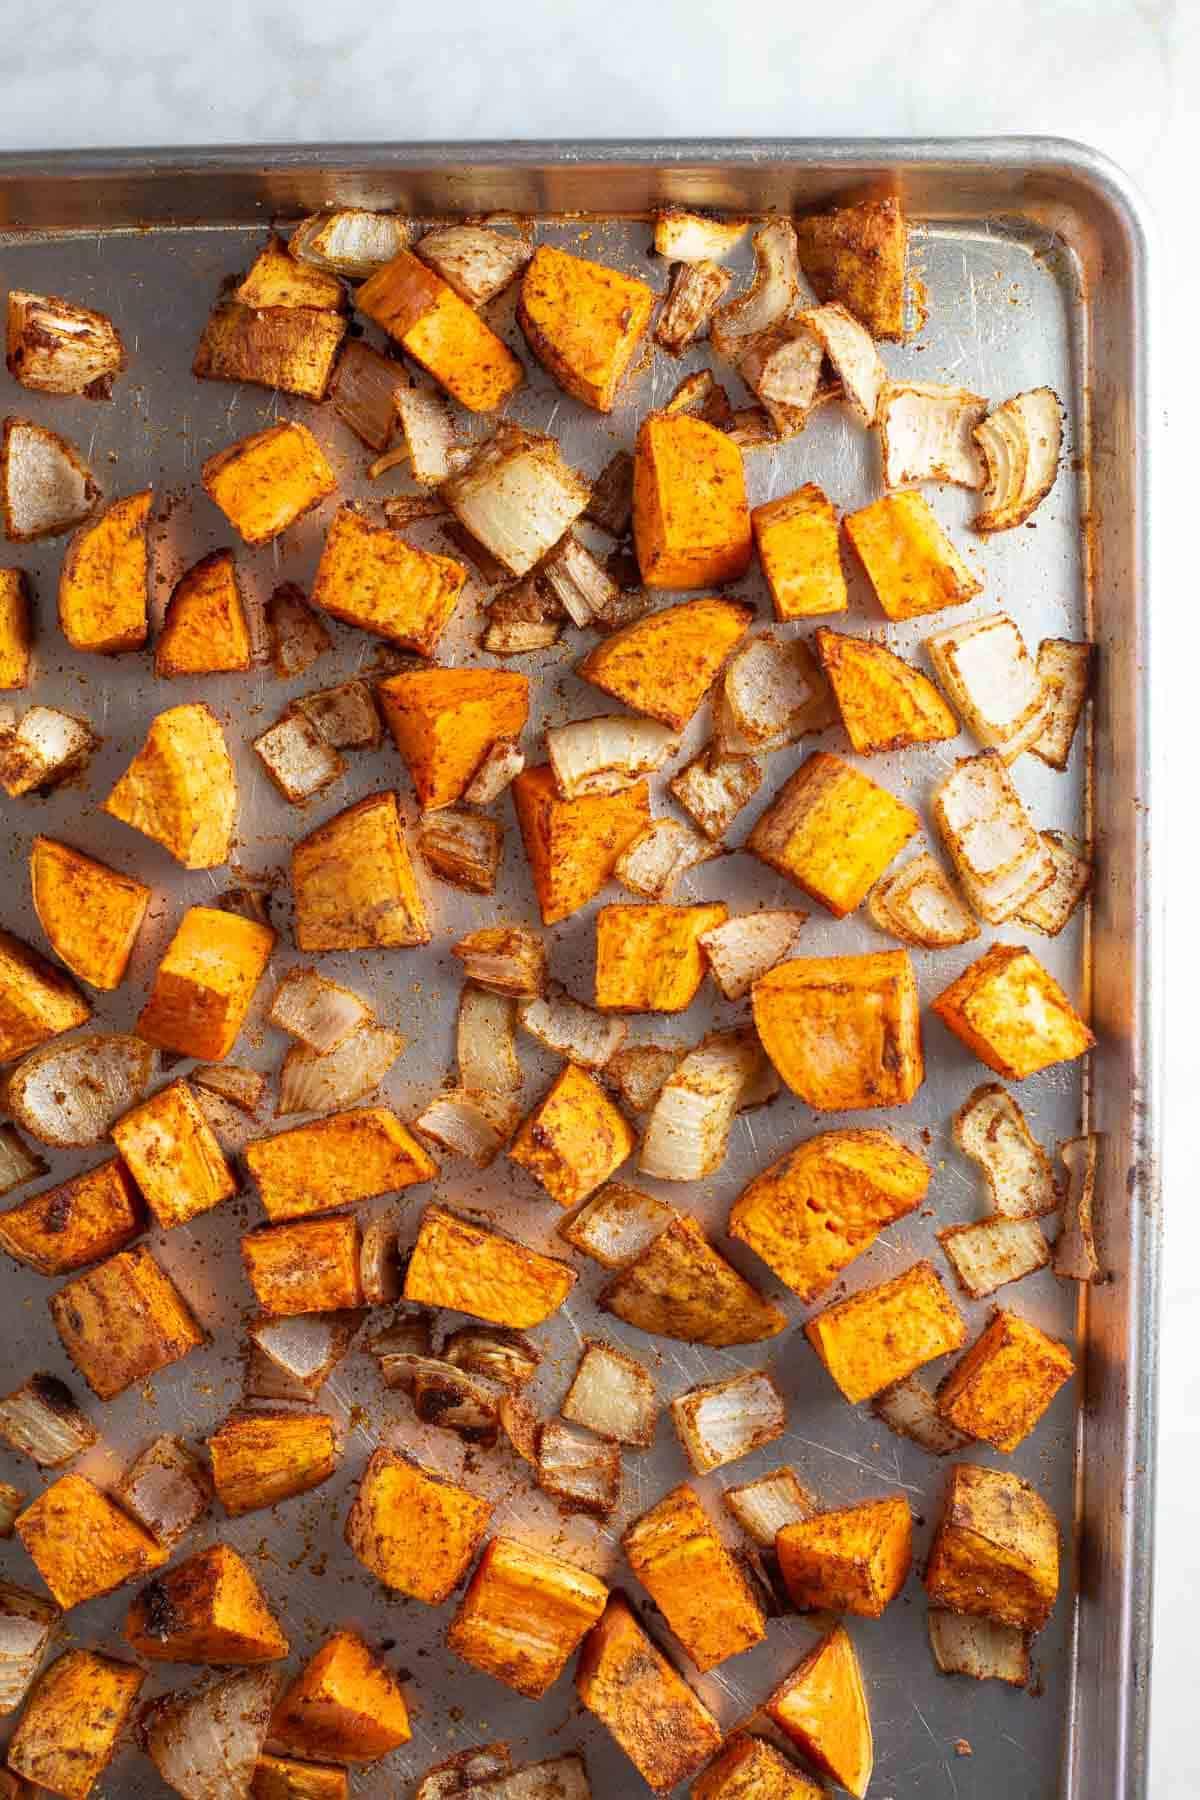 pan of roasted sweet potatoes